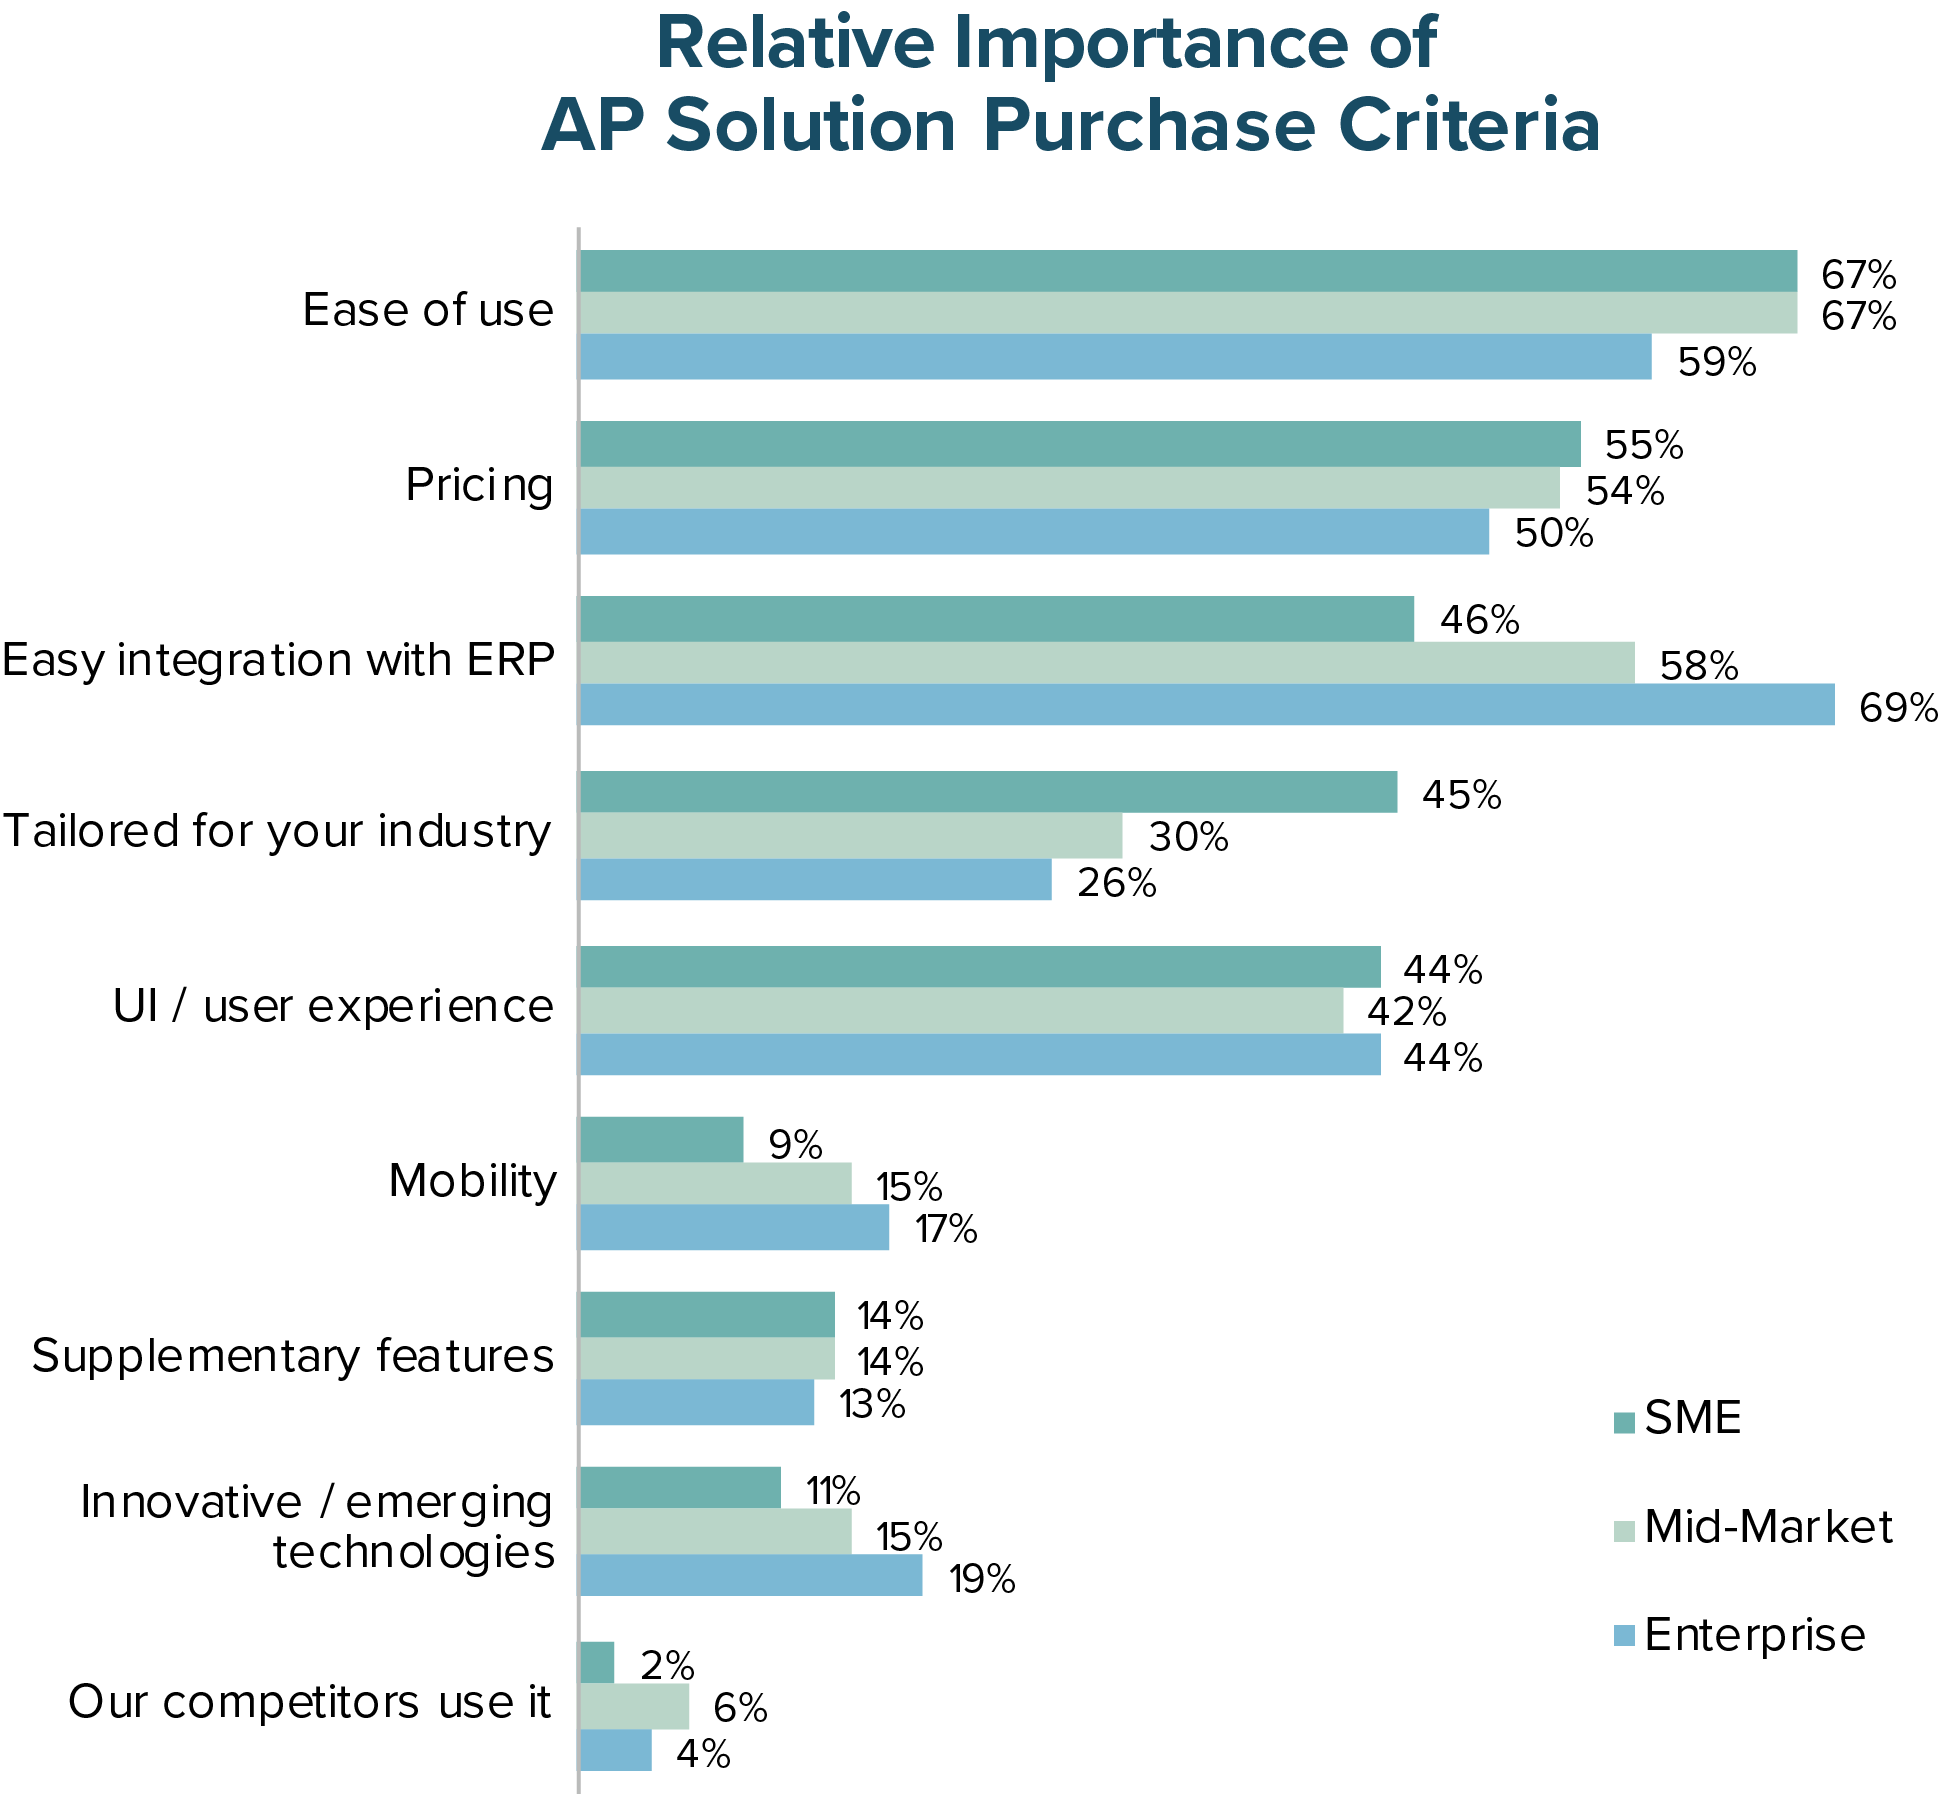 Relative Importance of AP Solution Purhcase Criteria